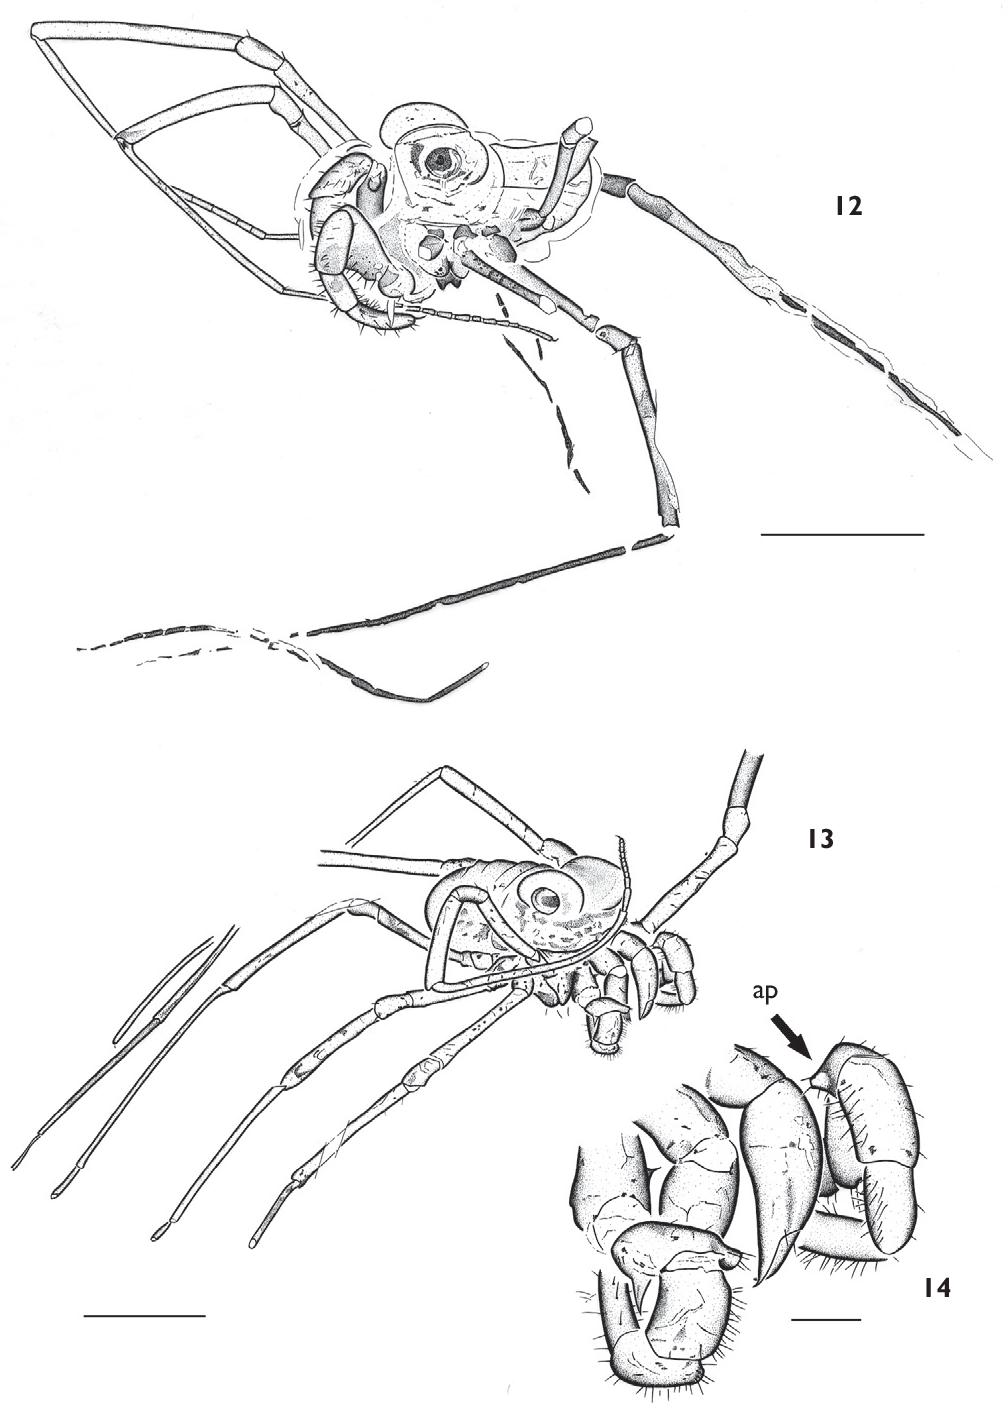 figure 12-14